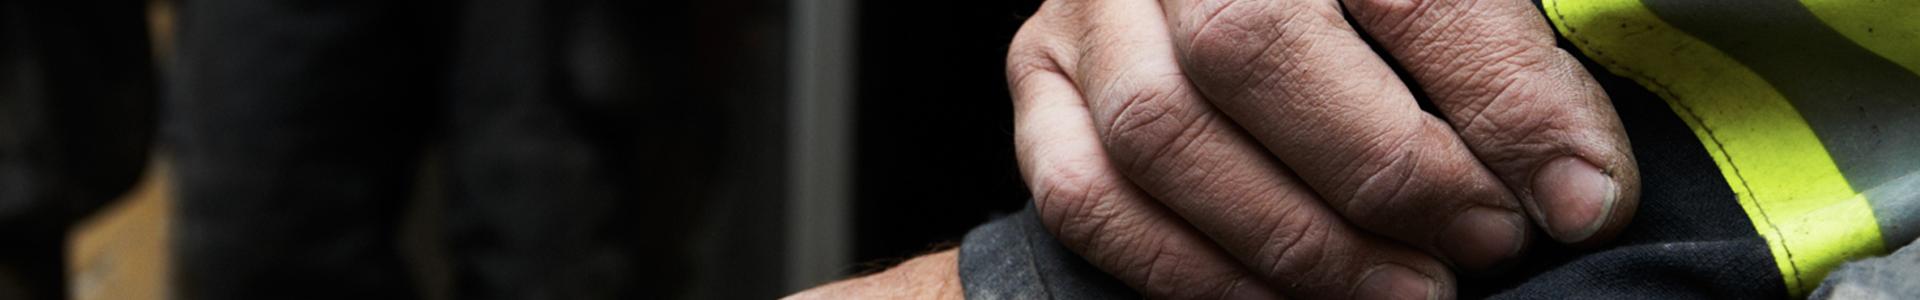 cancer prostate et employeur